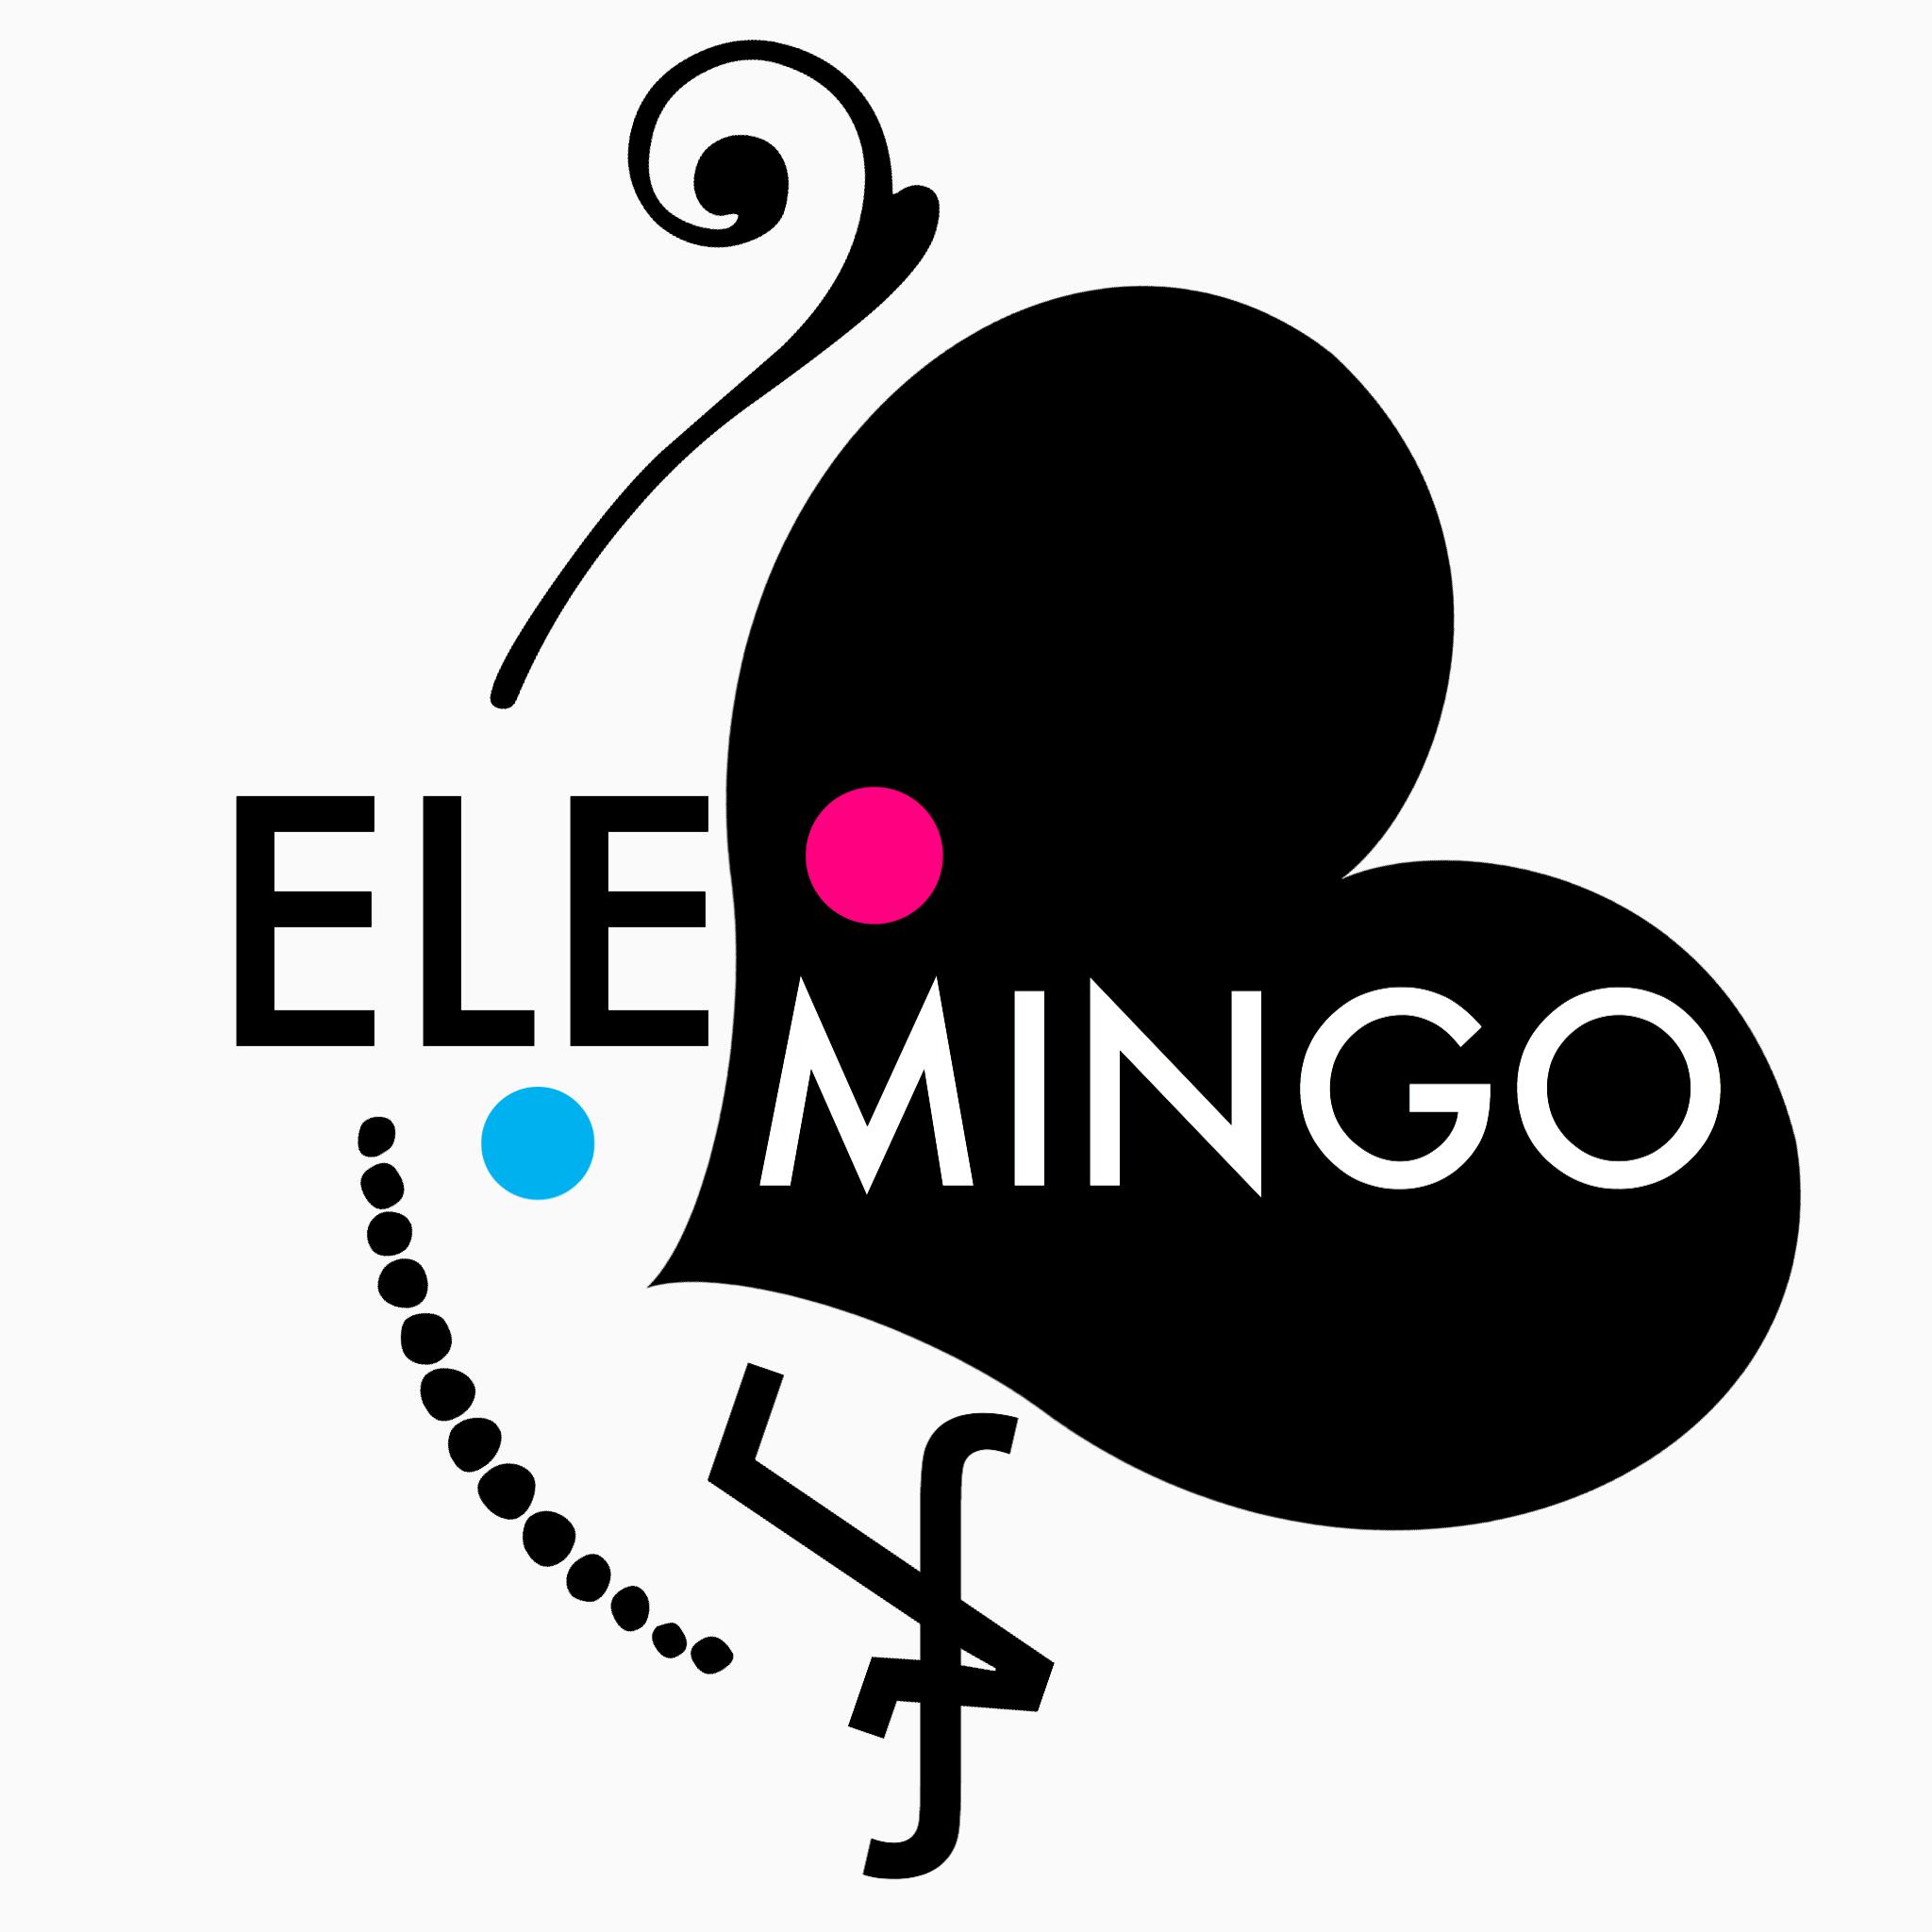 ELEMINGO